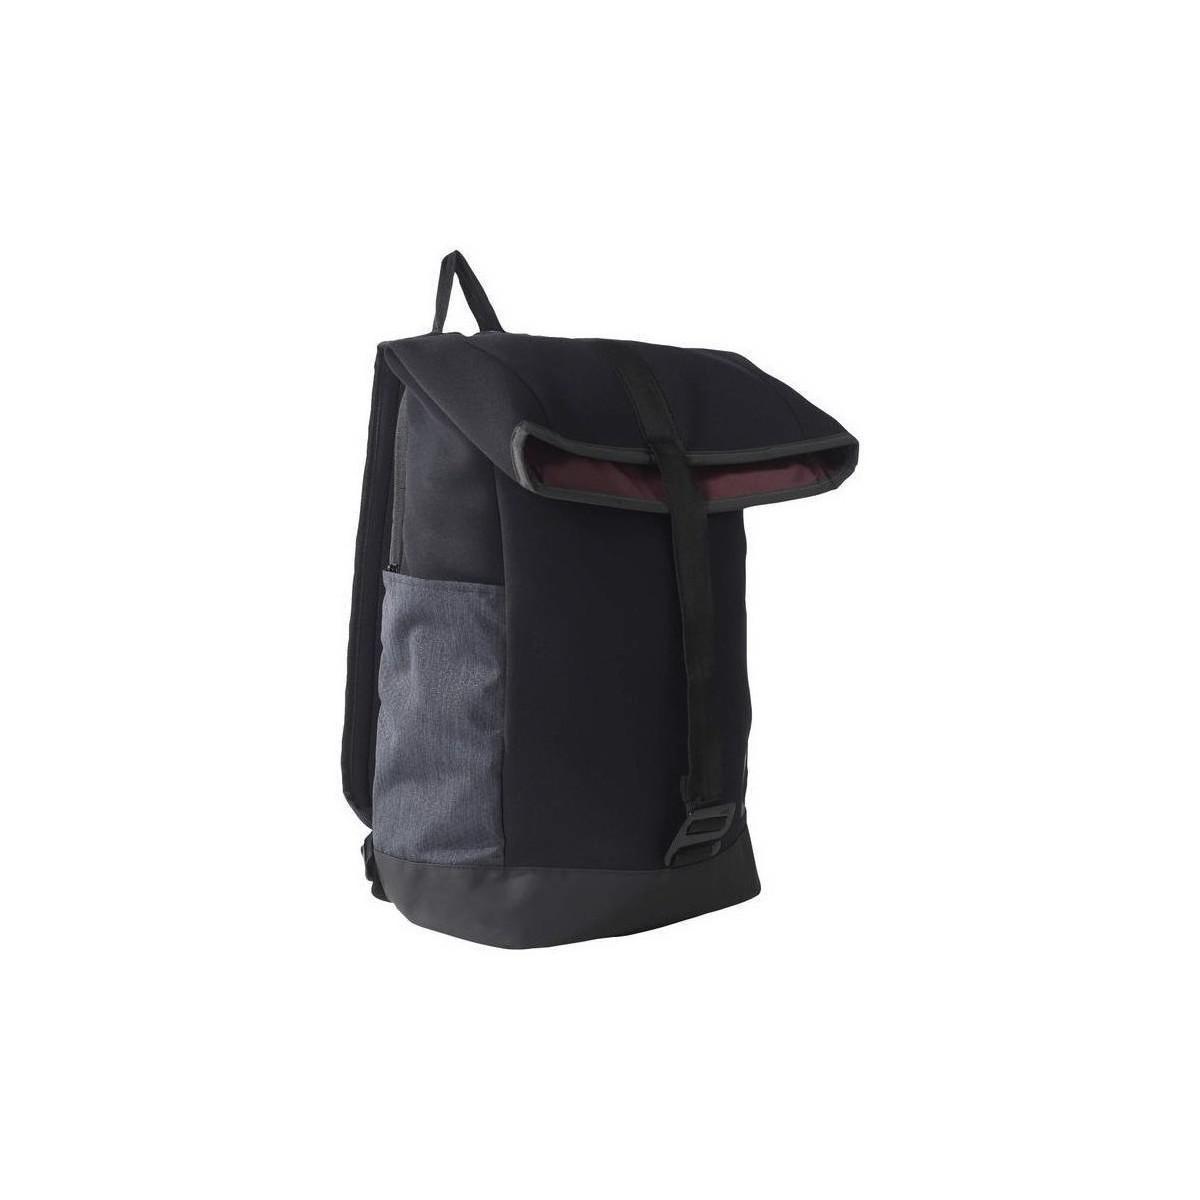 618241f11a3 Adidas Best Bp Women s Backpack In Black in Black for Men - Lyst